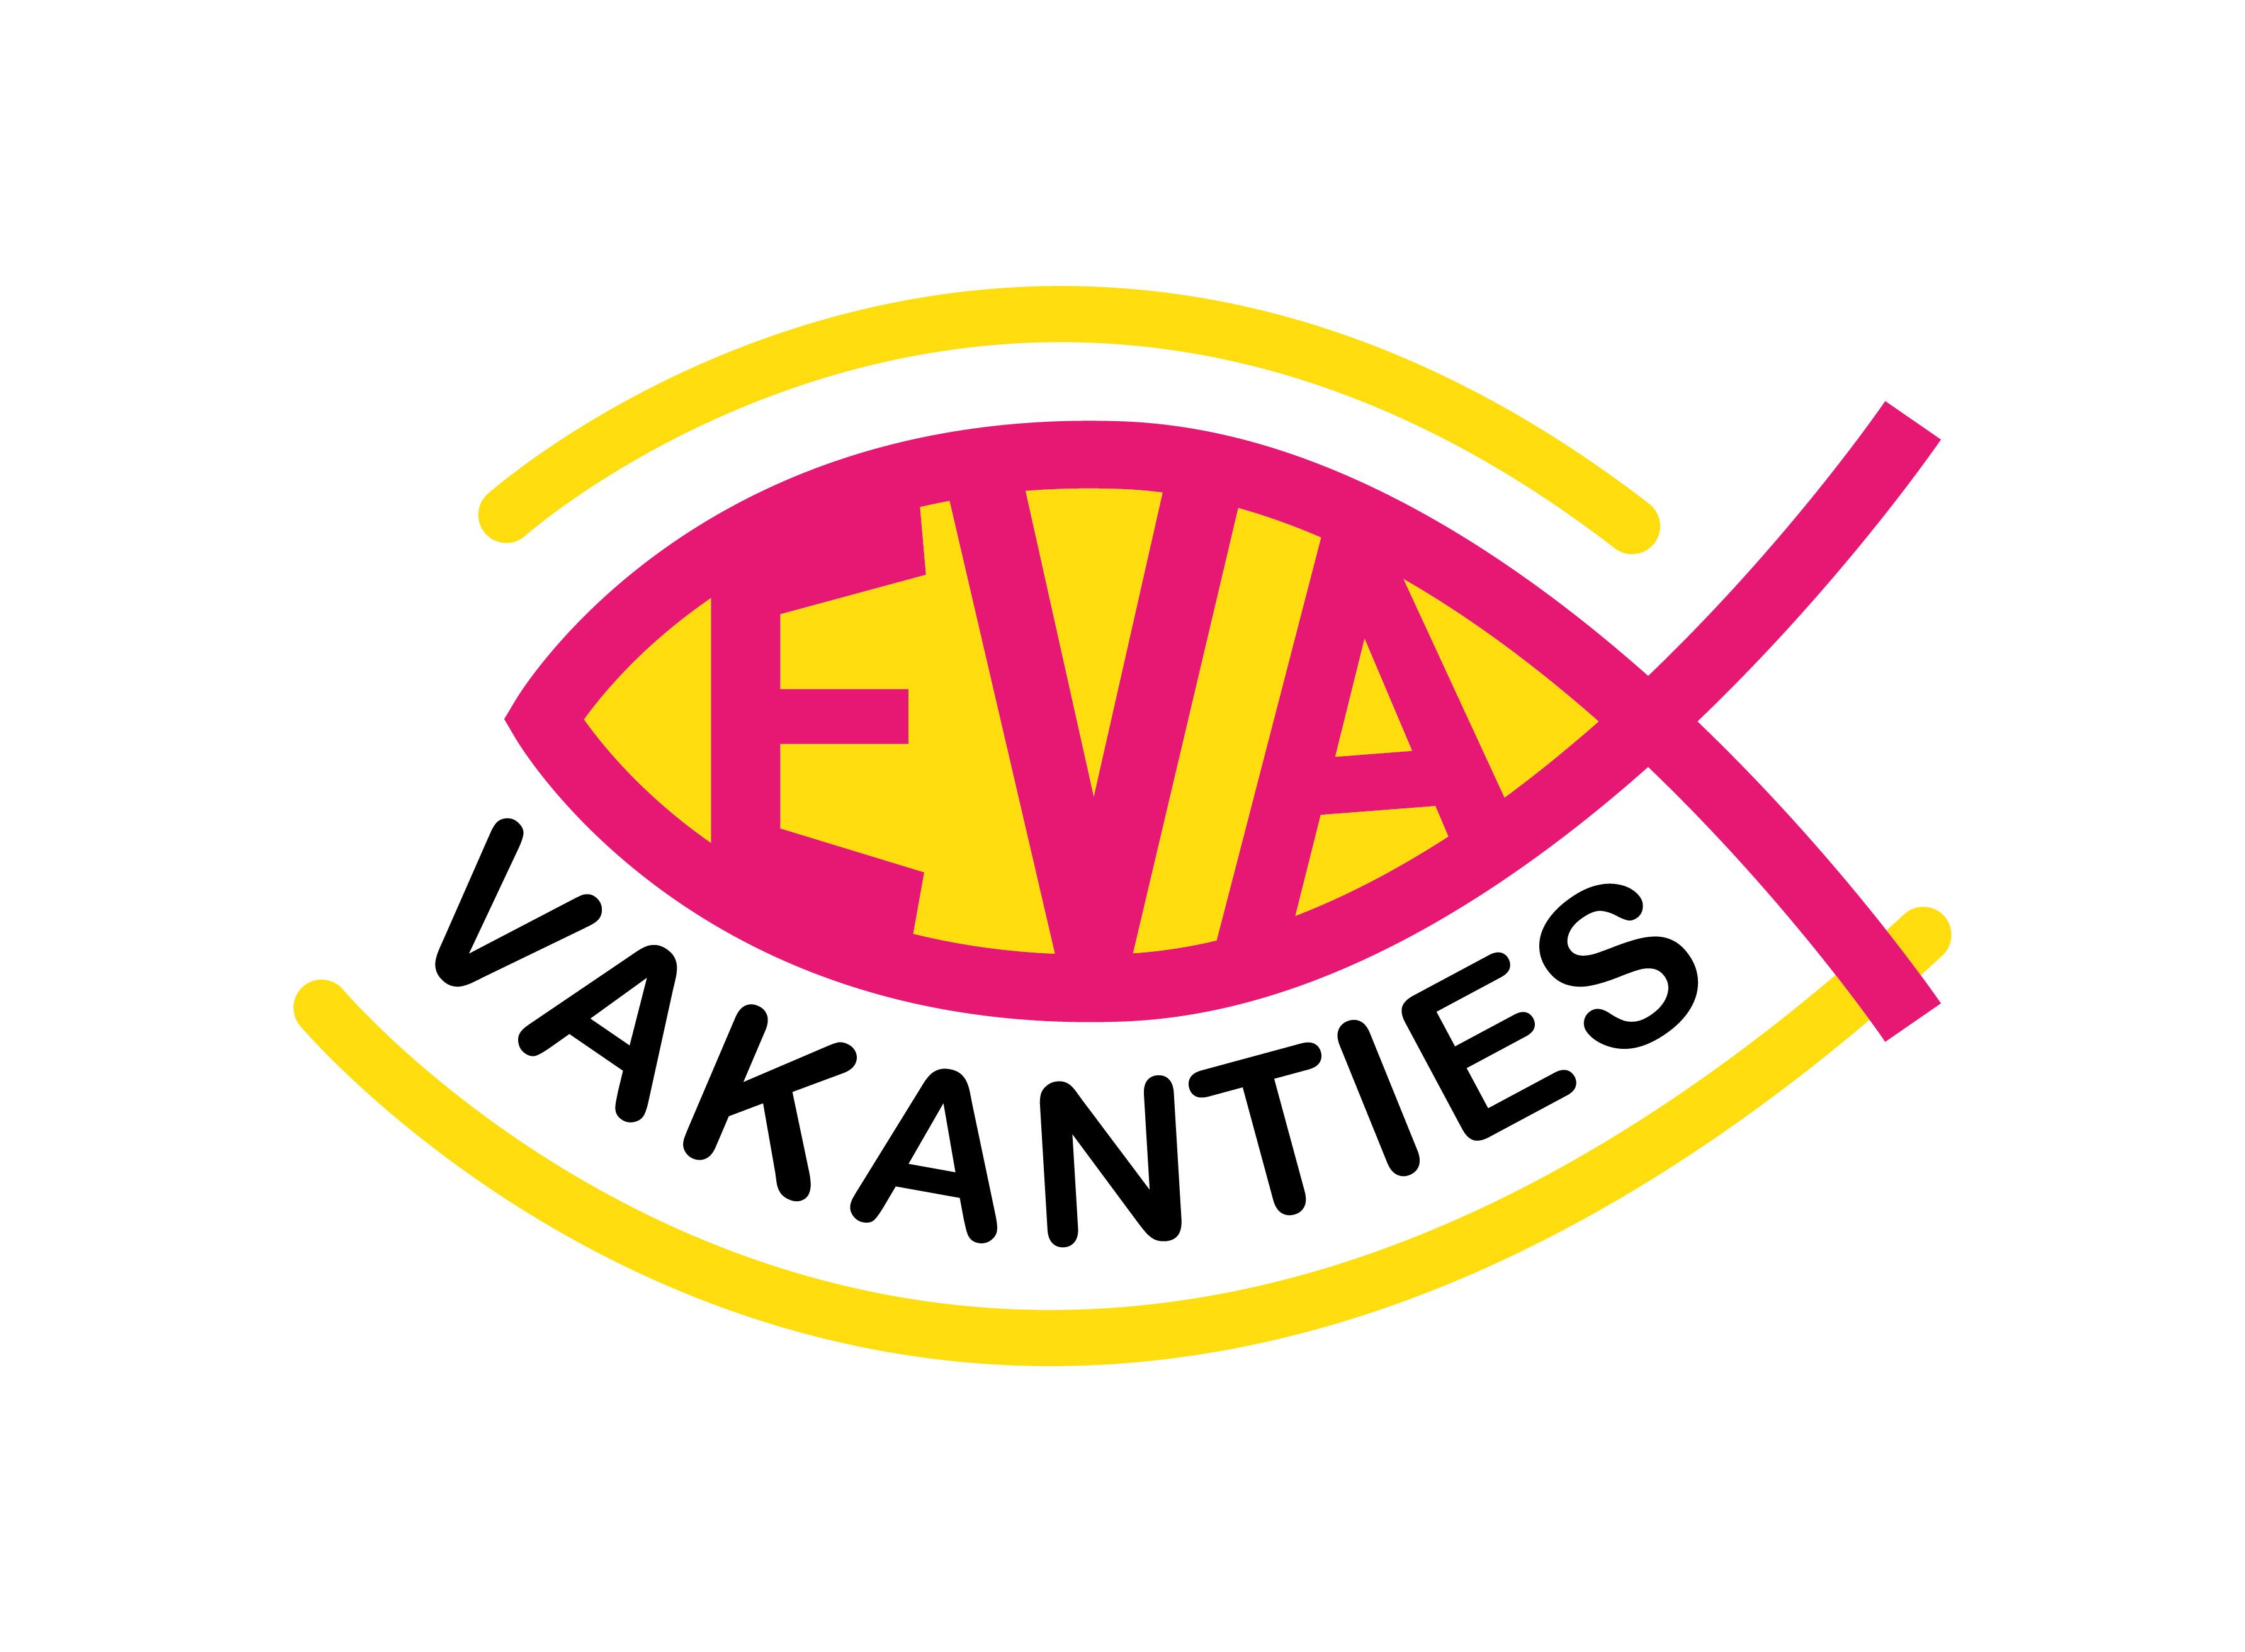 Eva Vakanties